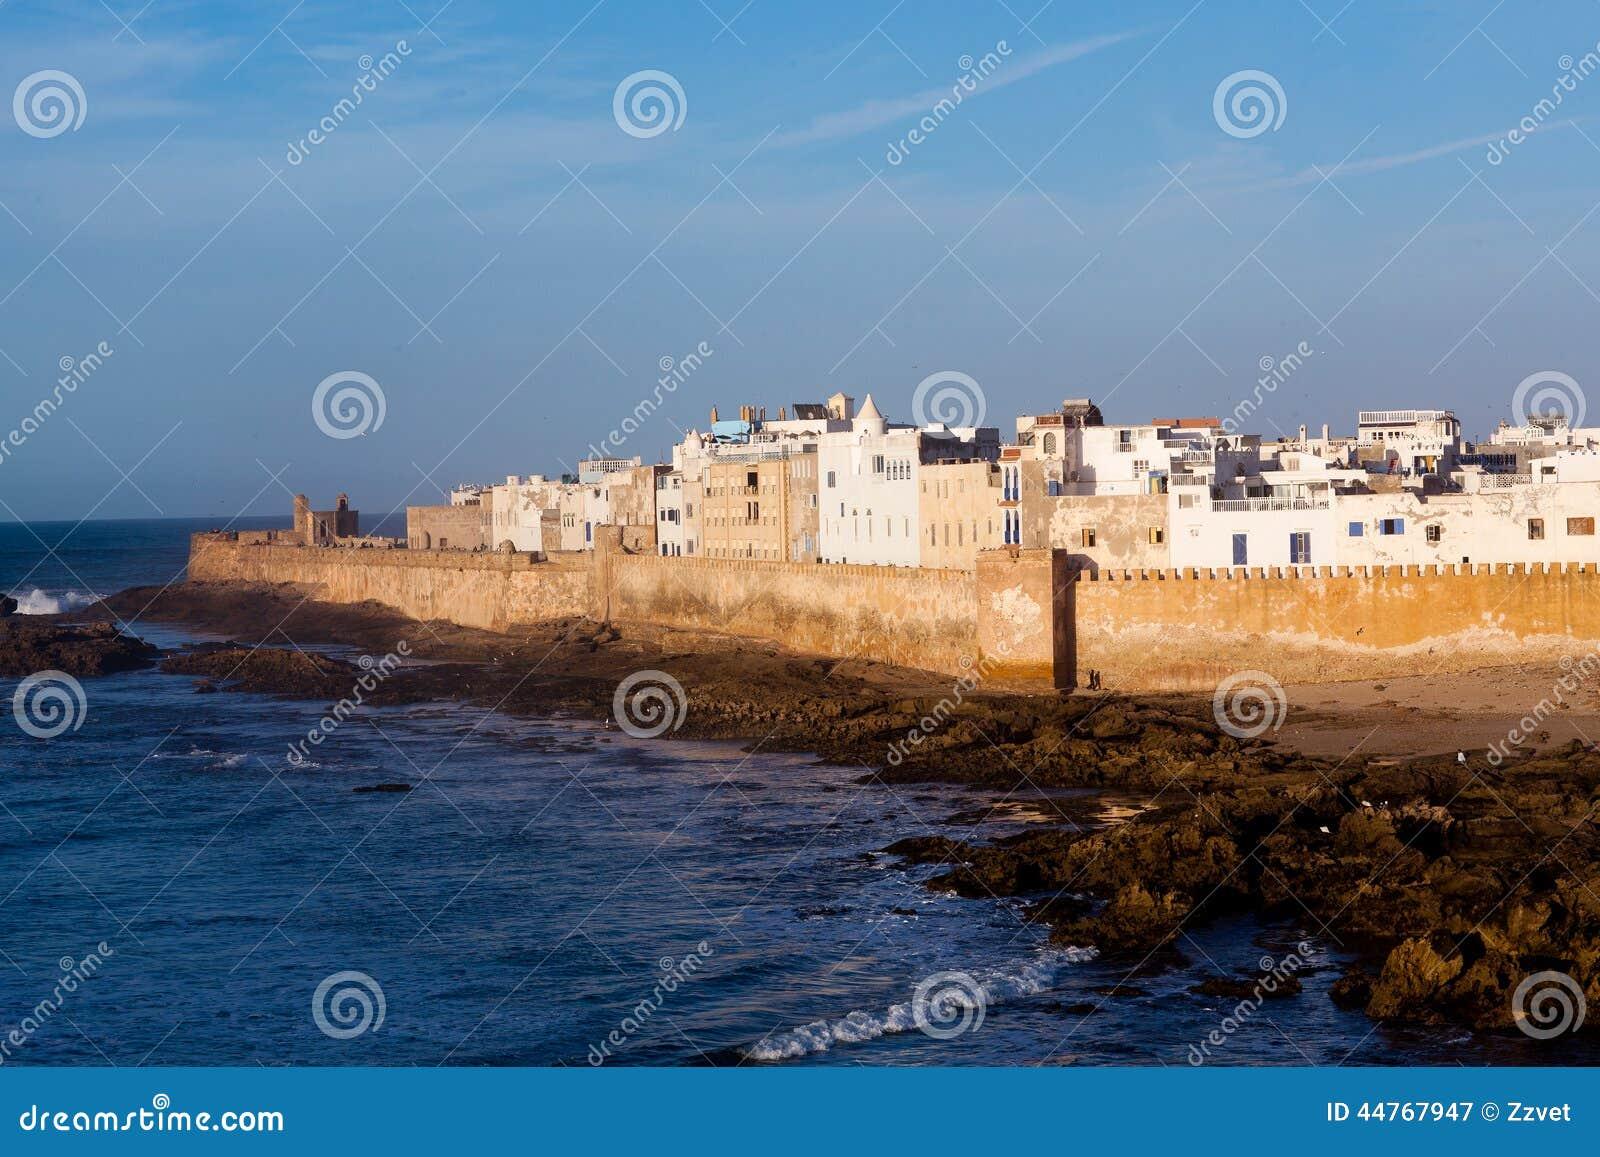 Essaouira Morocco  city photos gallery : Essaouira Fortress, Morocco. Essaouira is a city in the western ...